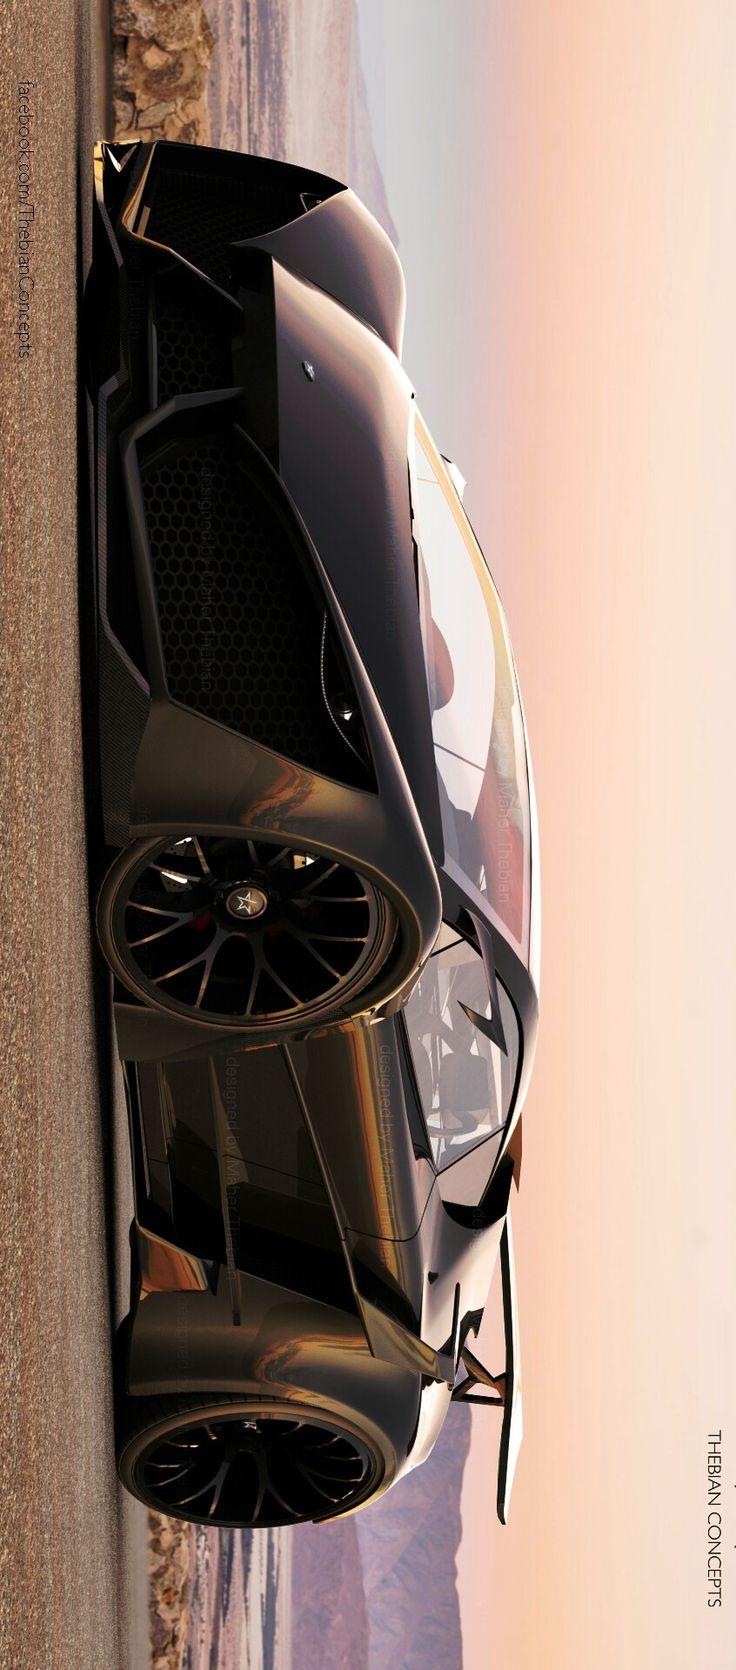 (°!°) Lamborghini Sinistro designed by Maher Thebian